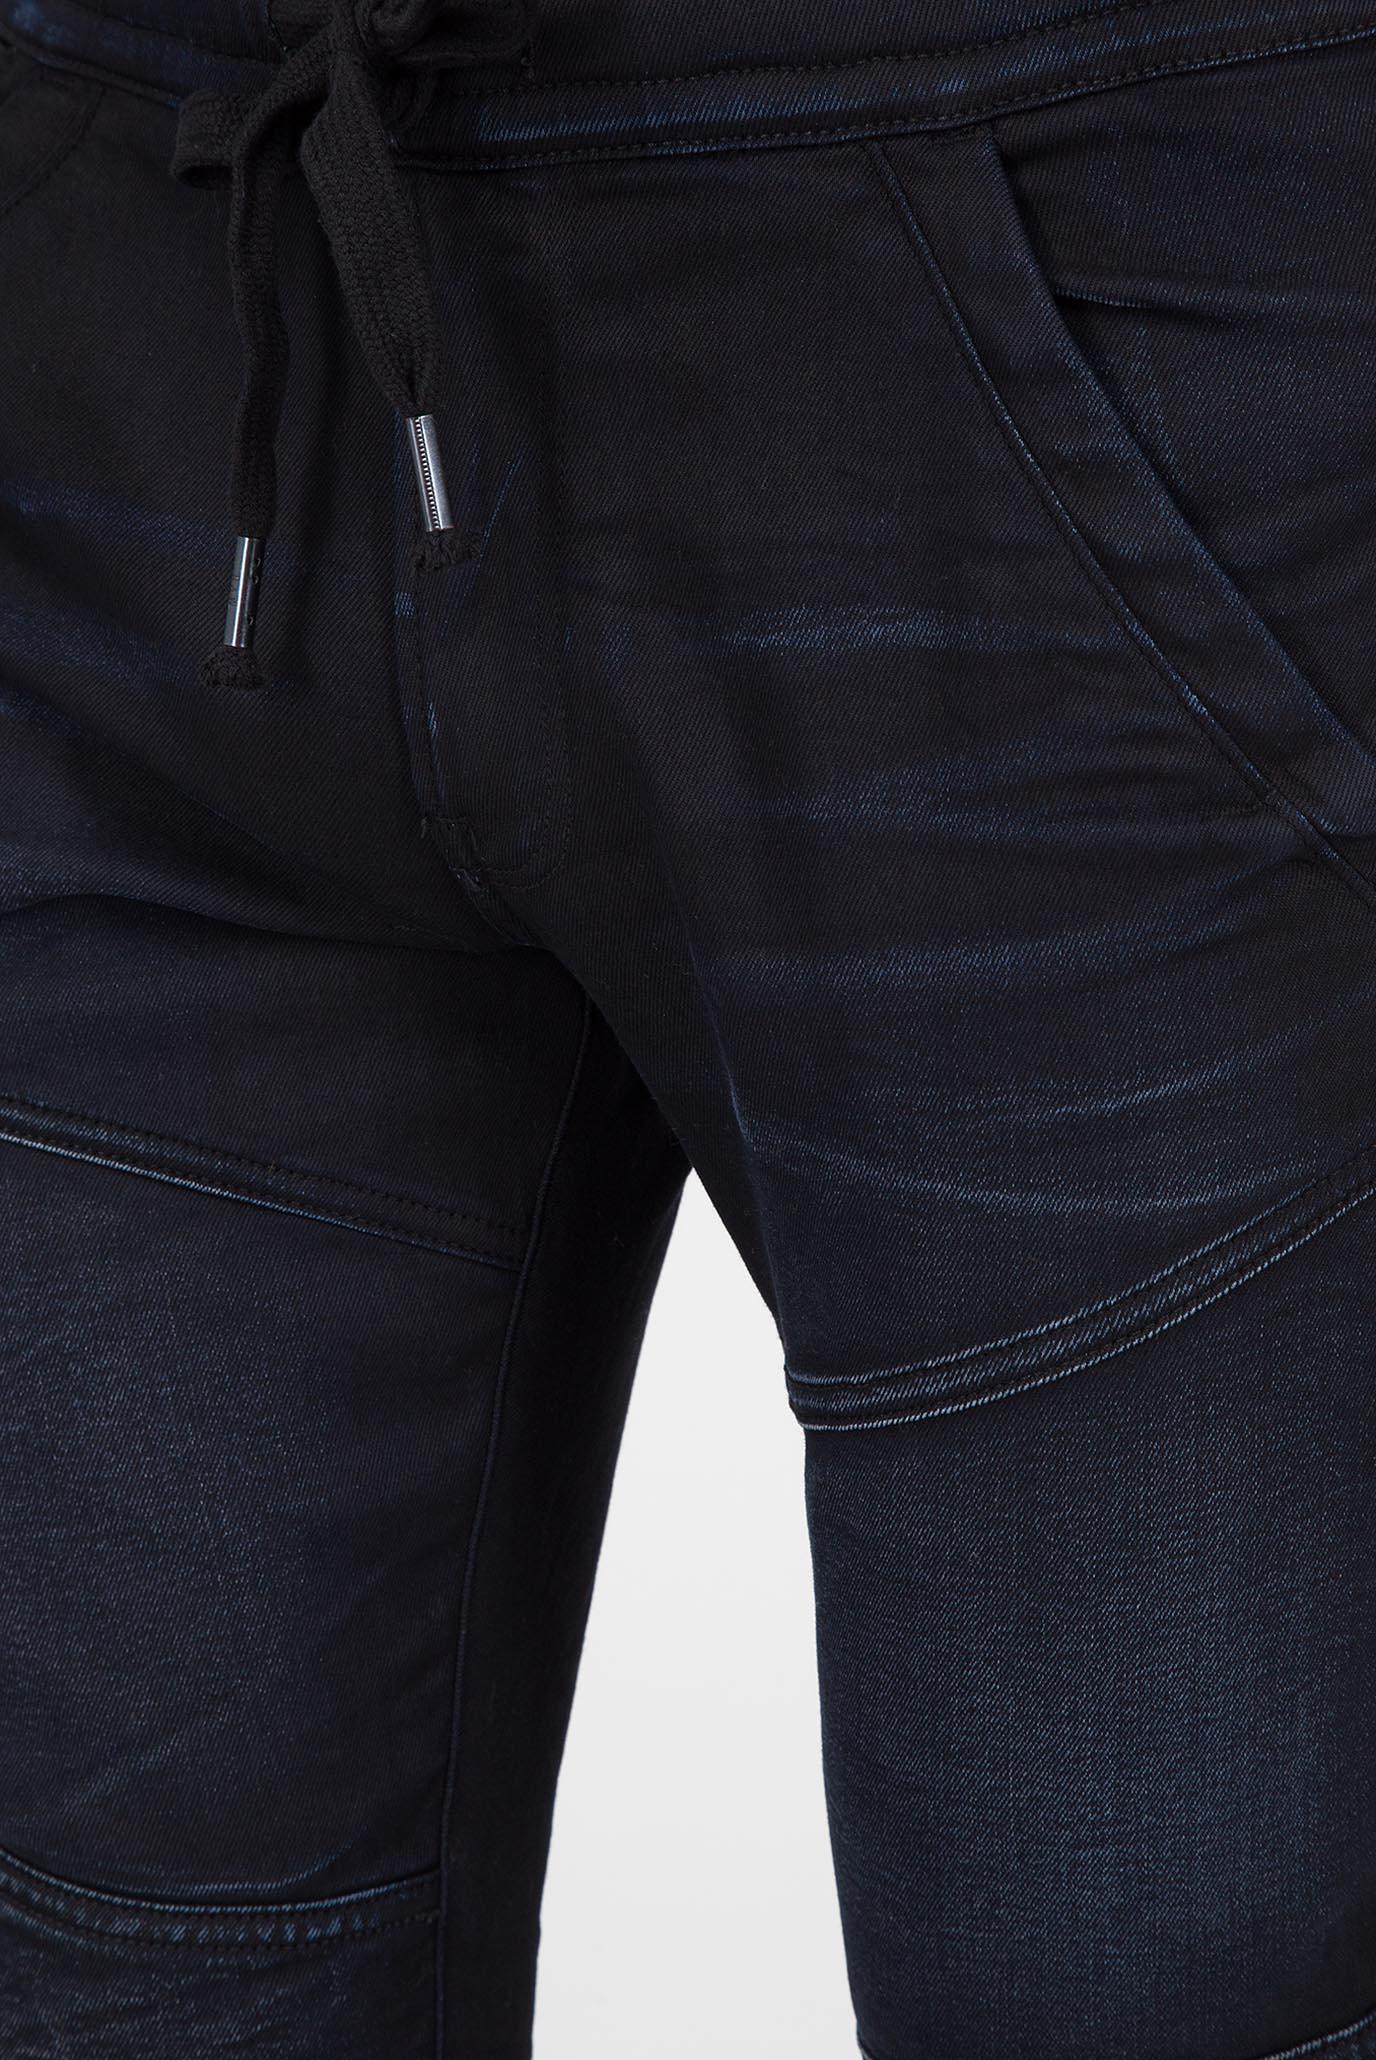 Мужские темно-синие джинсы Rackam G-Star RAW